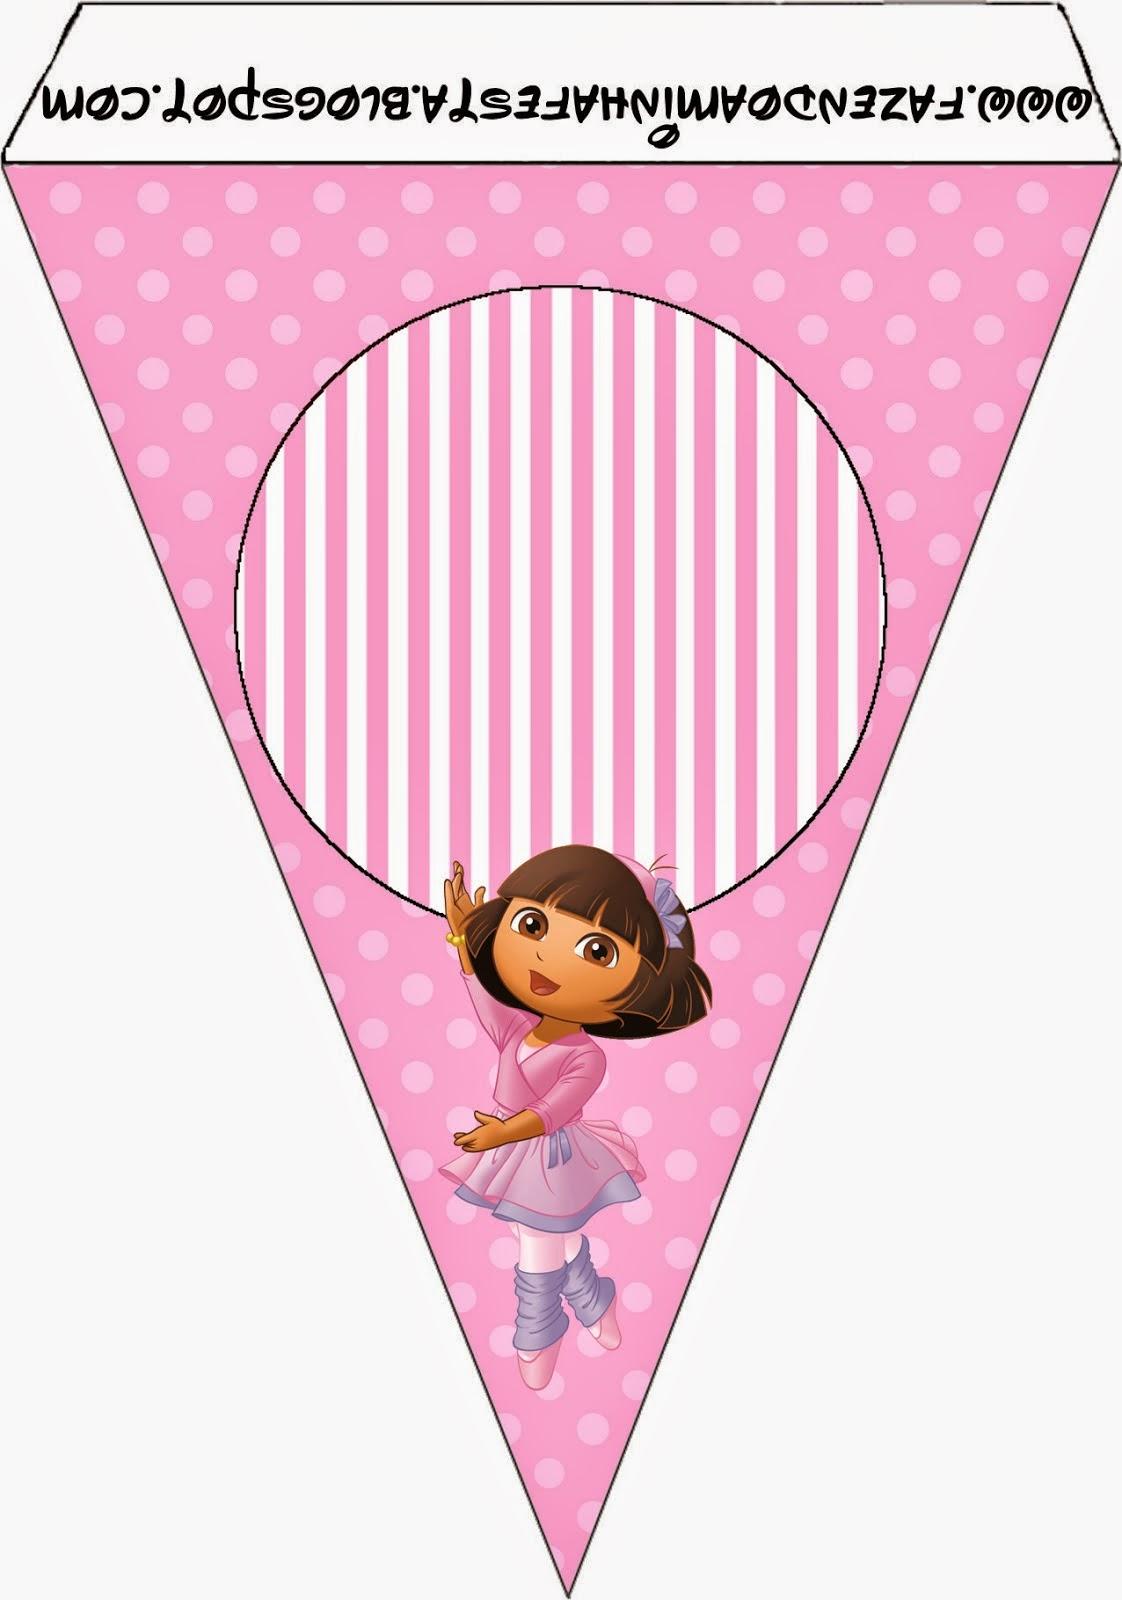 Dora Dancing Ballet: Free Party Printable. - Oh My Fiesta ...